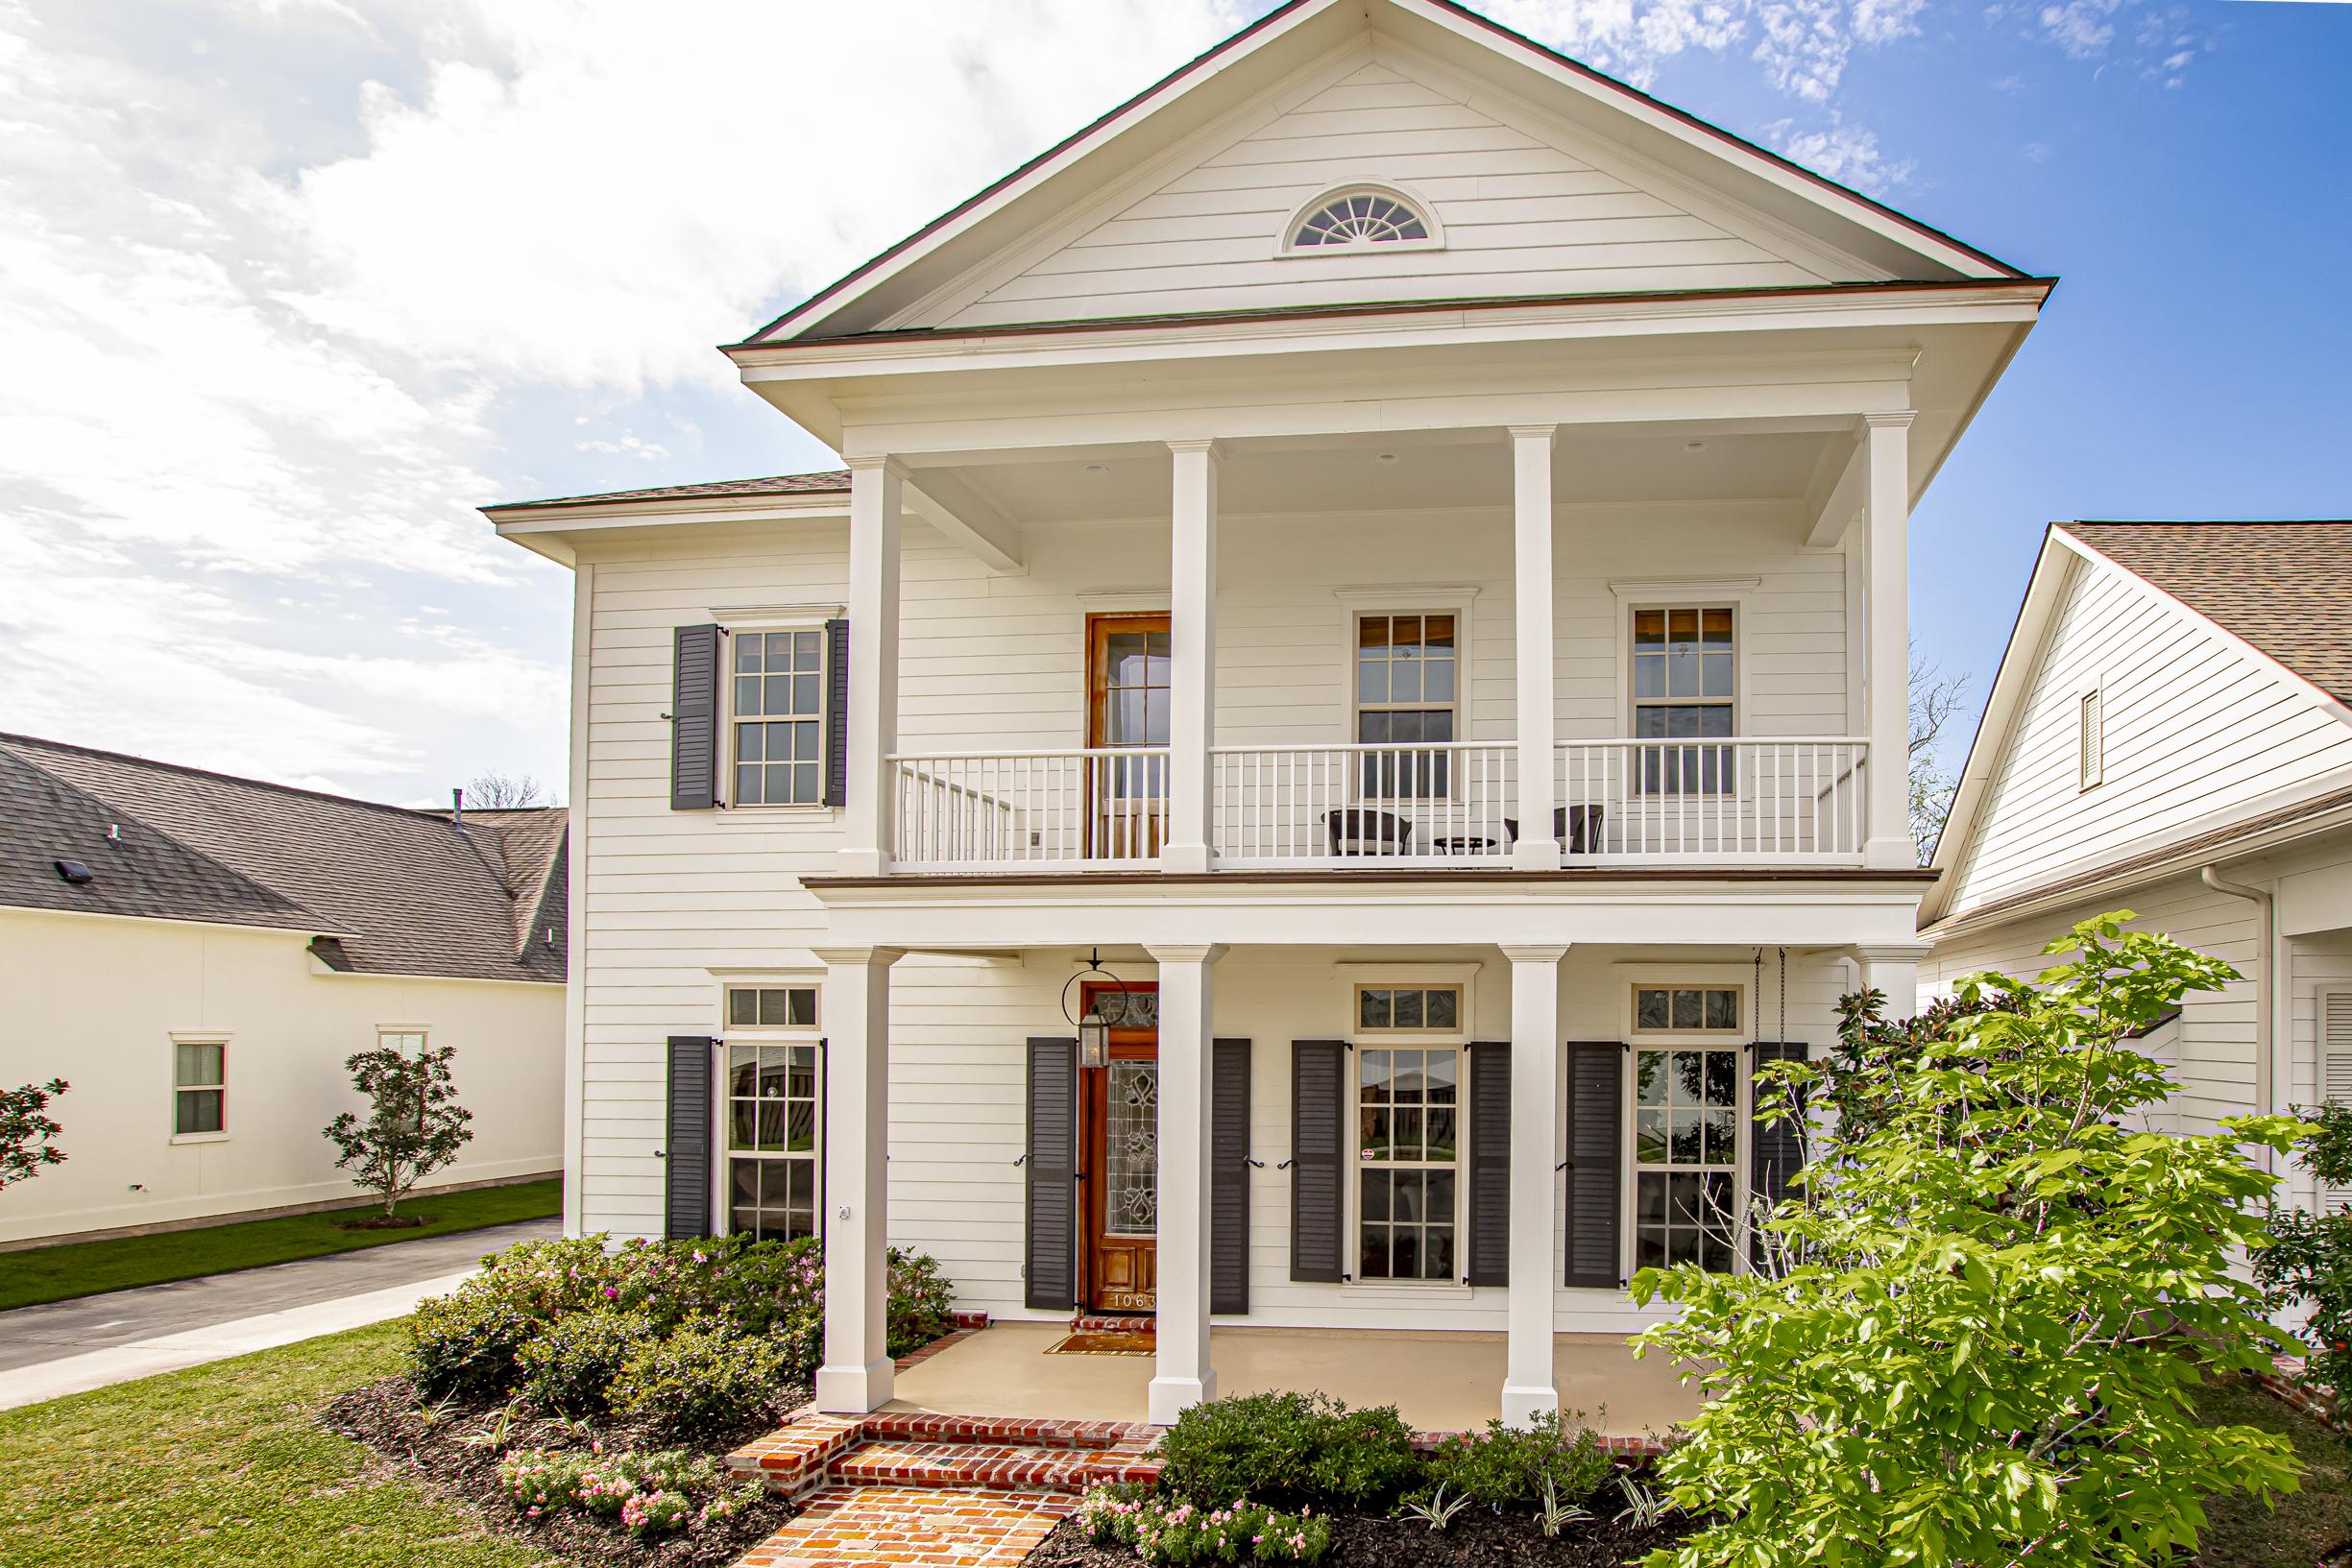 4BR home for sale in The Preserve at Harveston